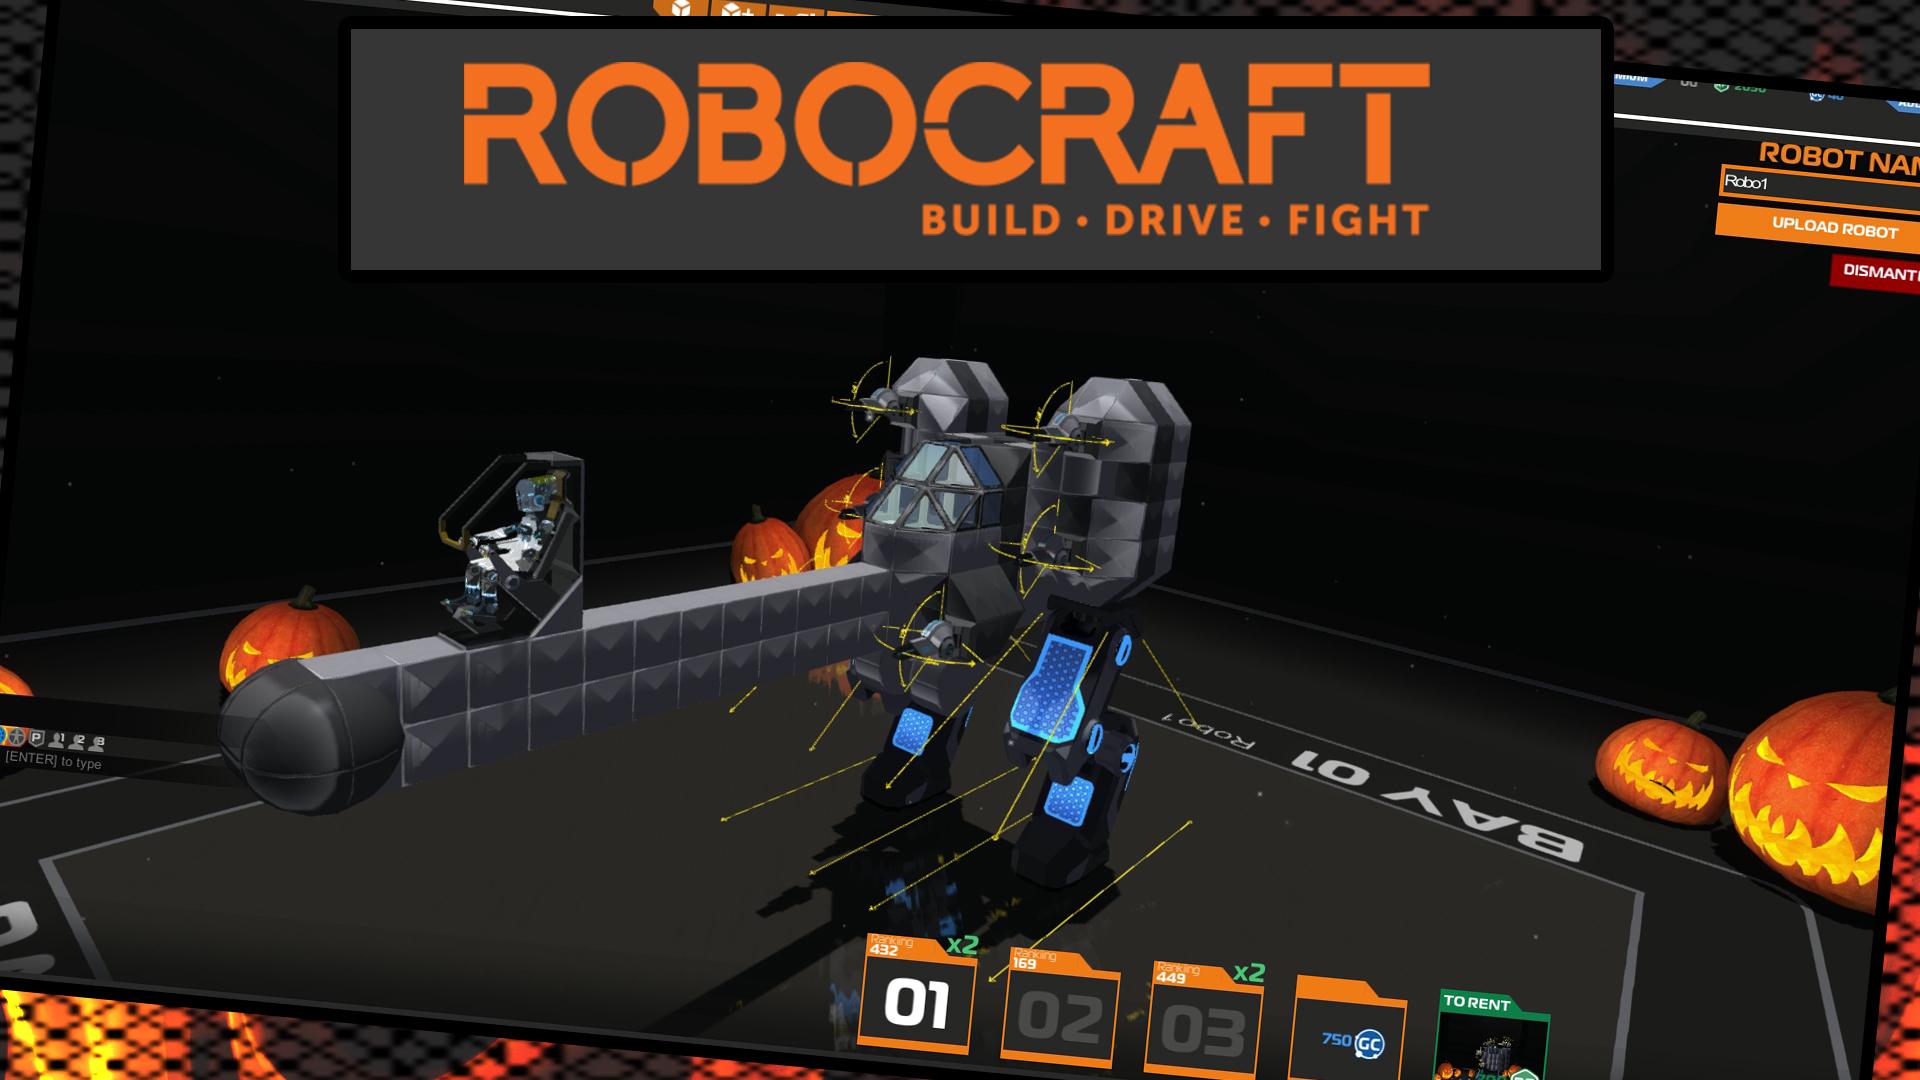 Robocraft Icon by osflipper09 on DeviantArt